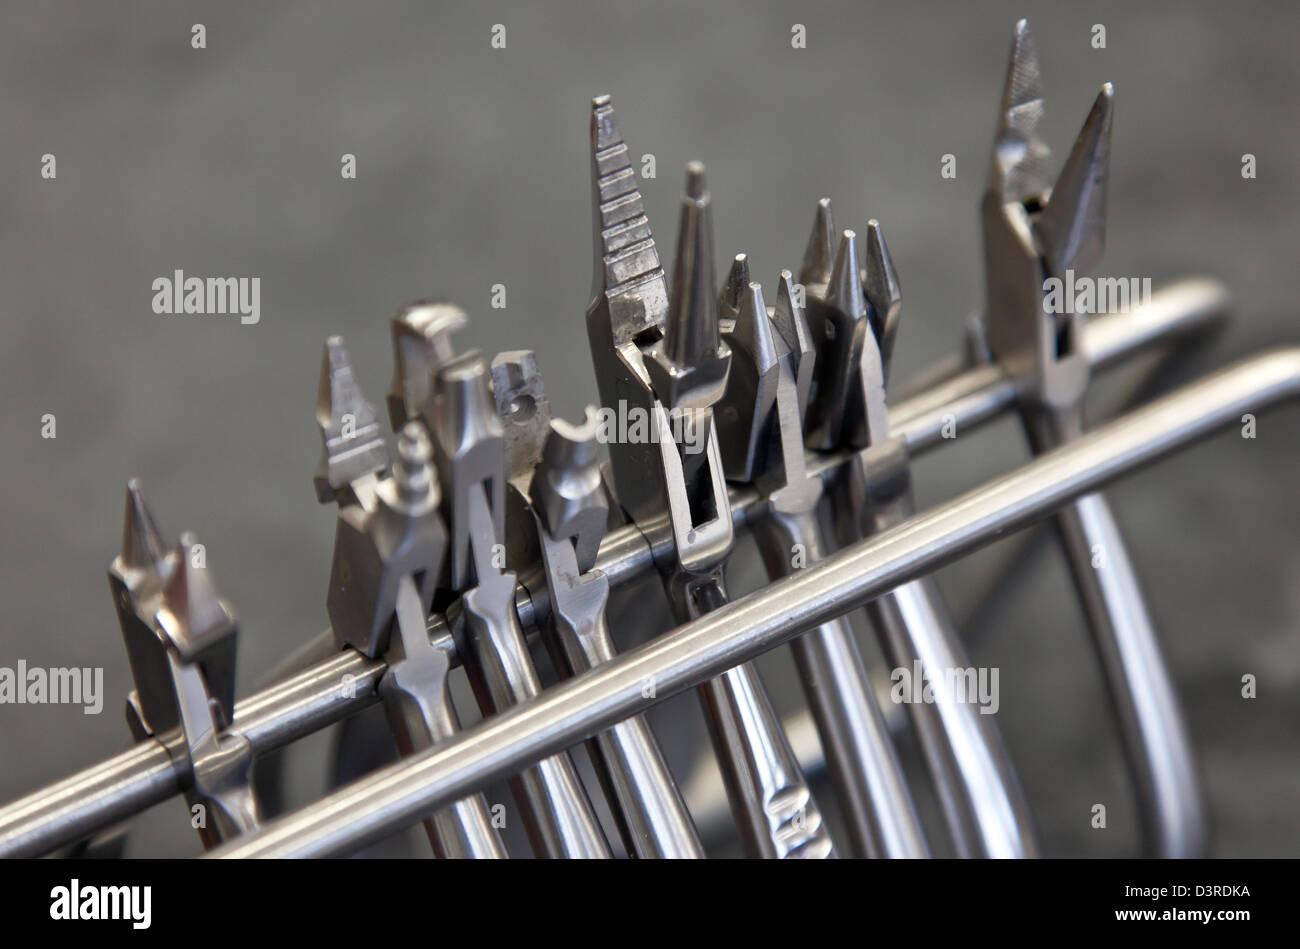 Wire Braces Stock Photos & Wire Braces Stock Images - Alamy